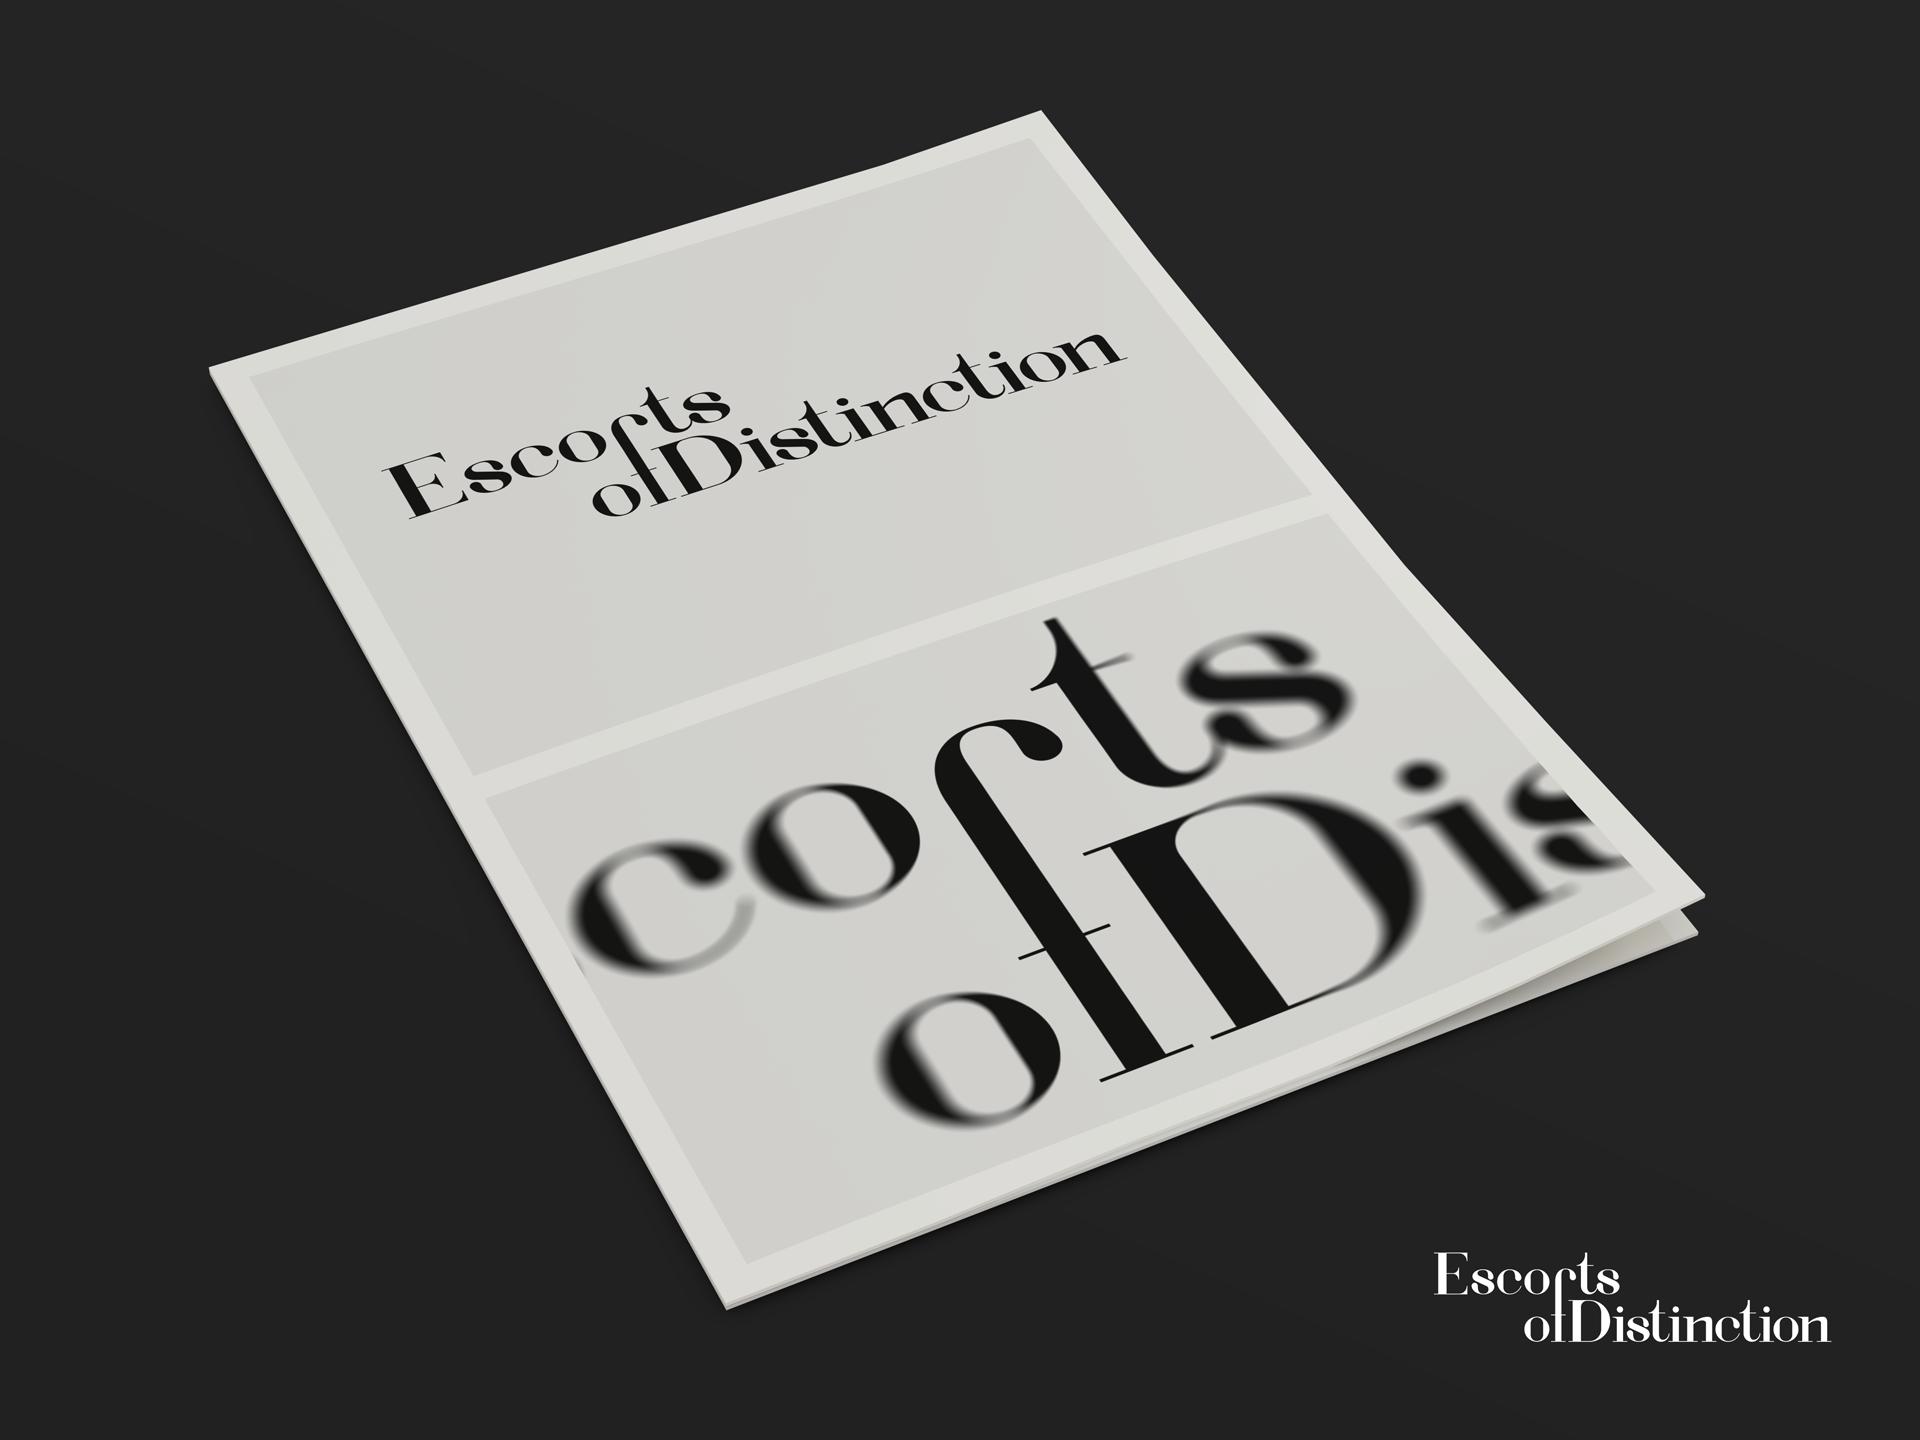 Escorts of Distinction - Graphic Designer Milton Keynes